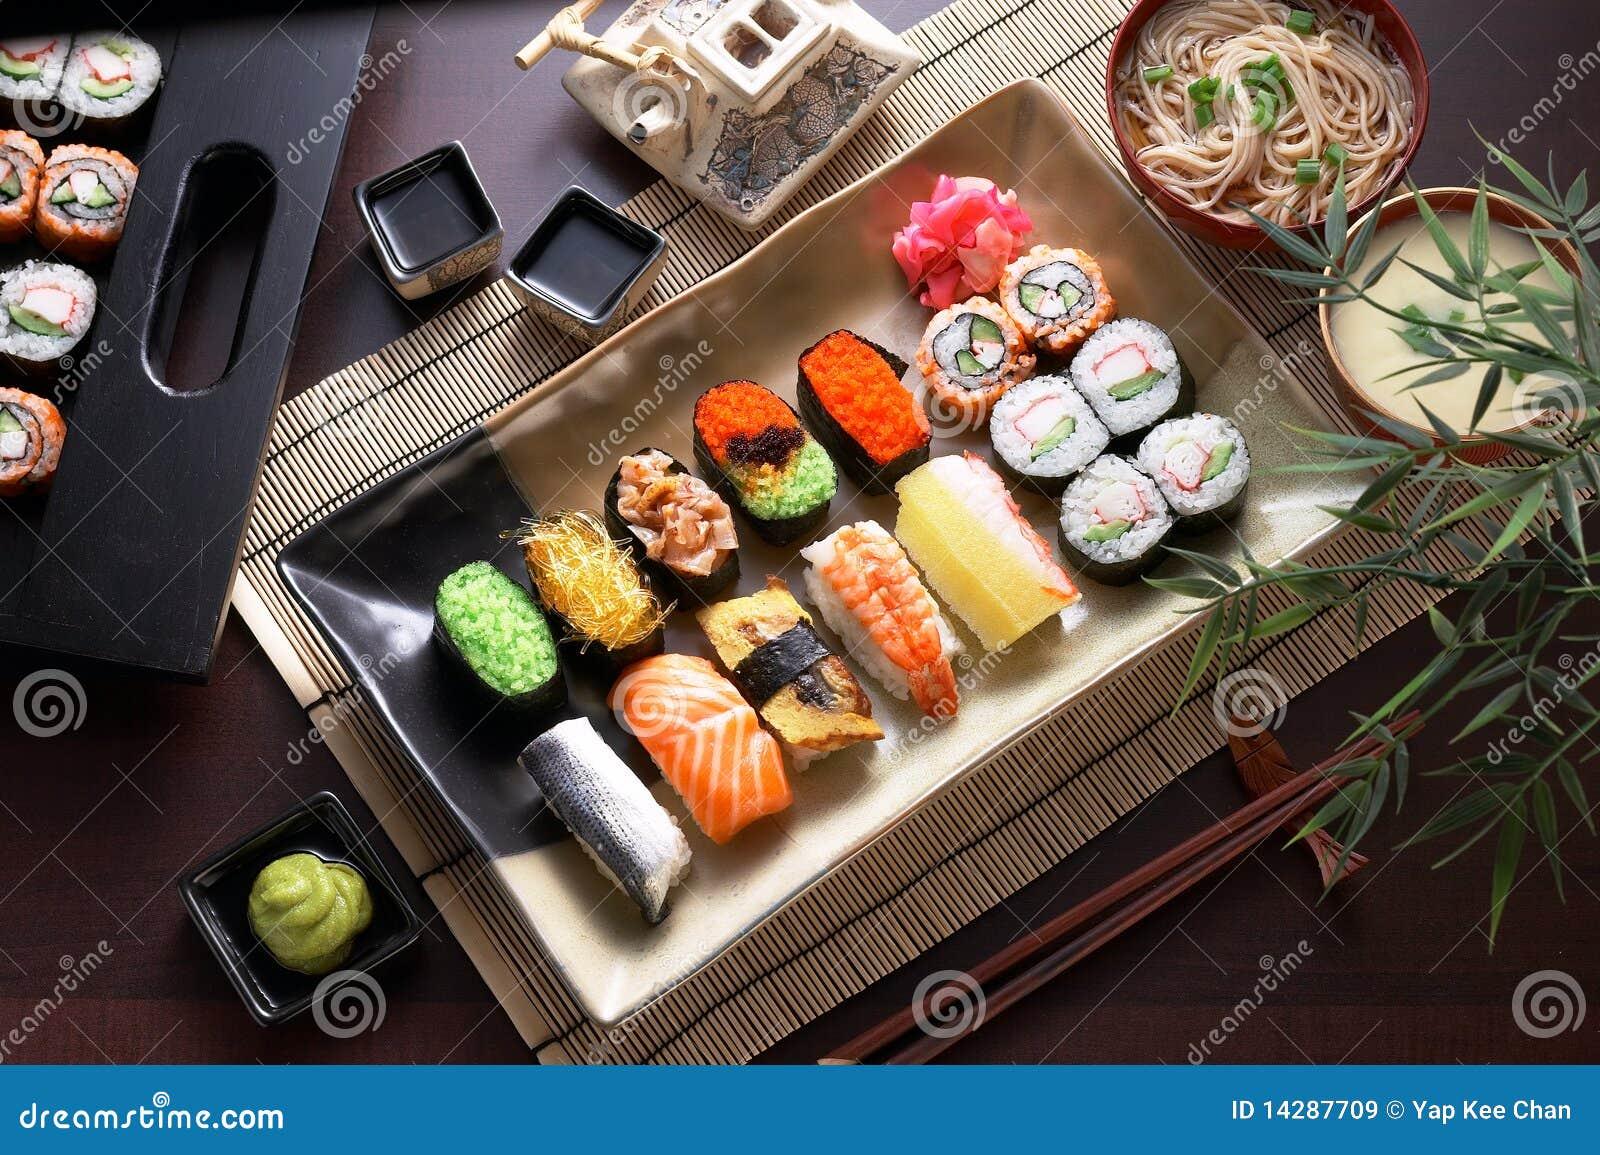 sushi platter royalty free stock images image 14287709 Auto Mechanic Logo Design auto mechanic clipart images